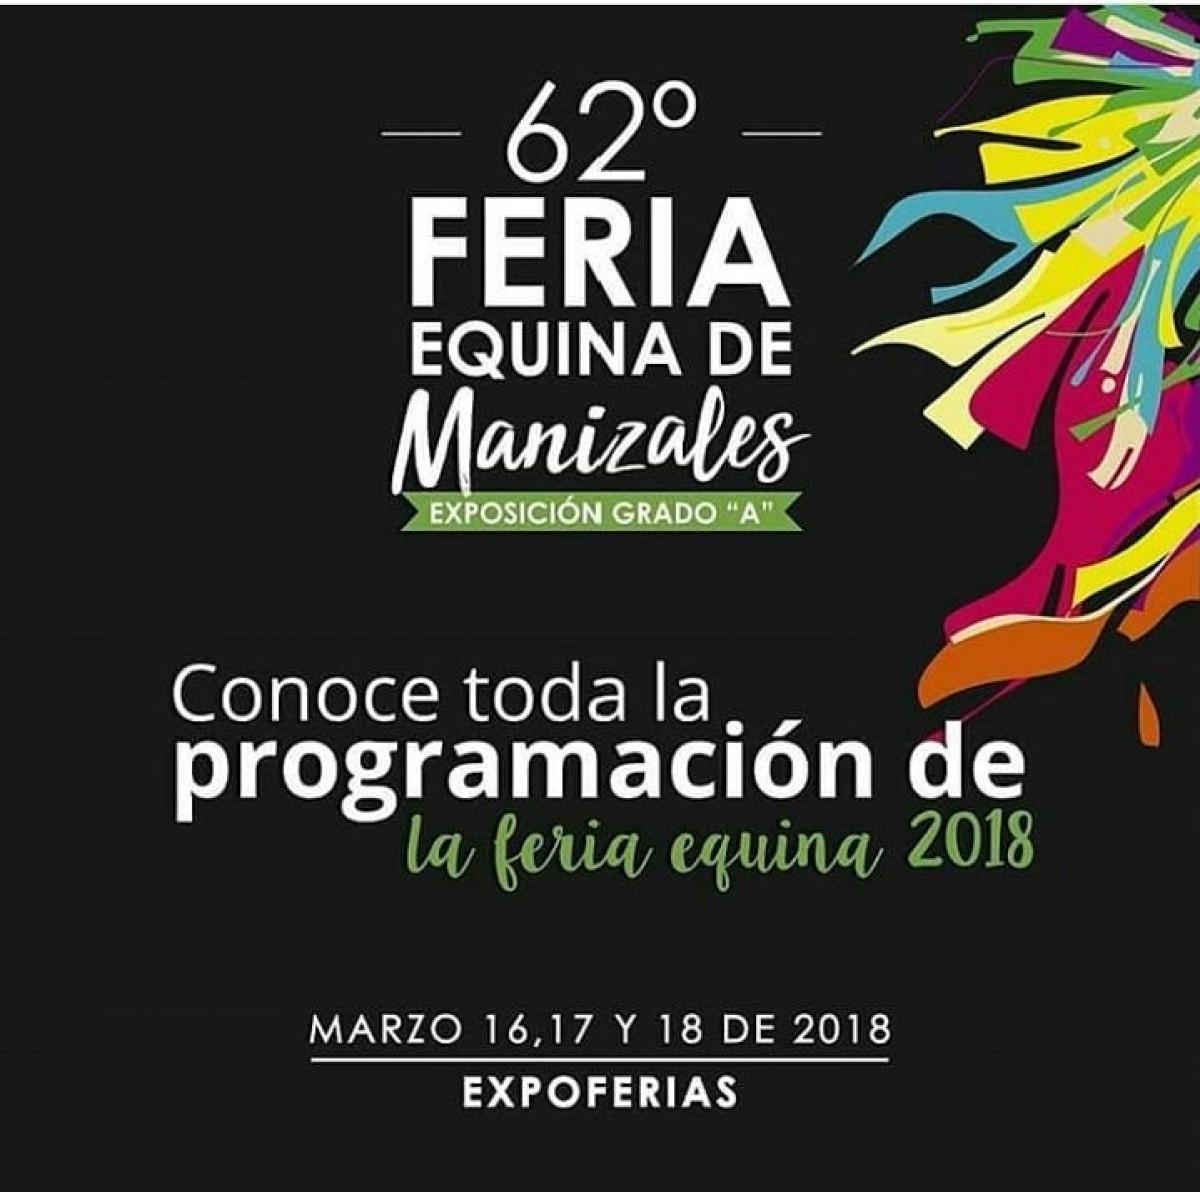 TRANSMISIÓN 62a Exposición Equina Grado A De Manizales 16 Al 18 De Marzo